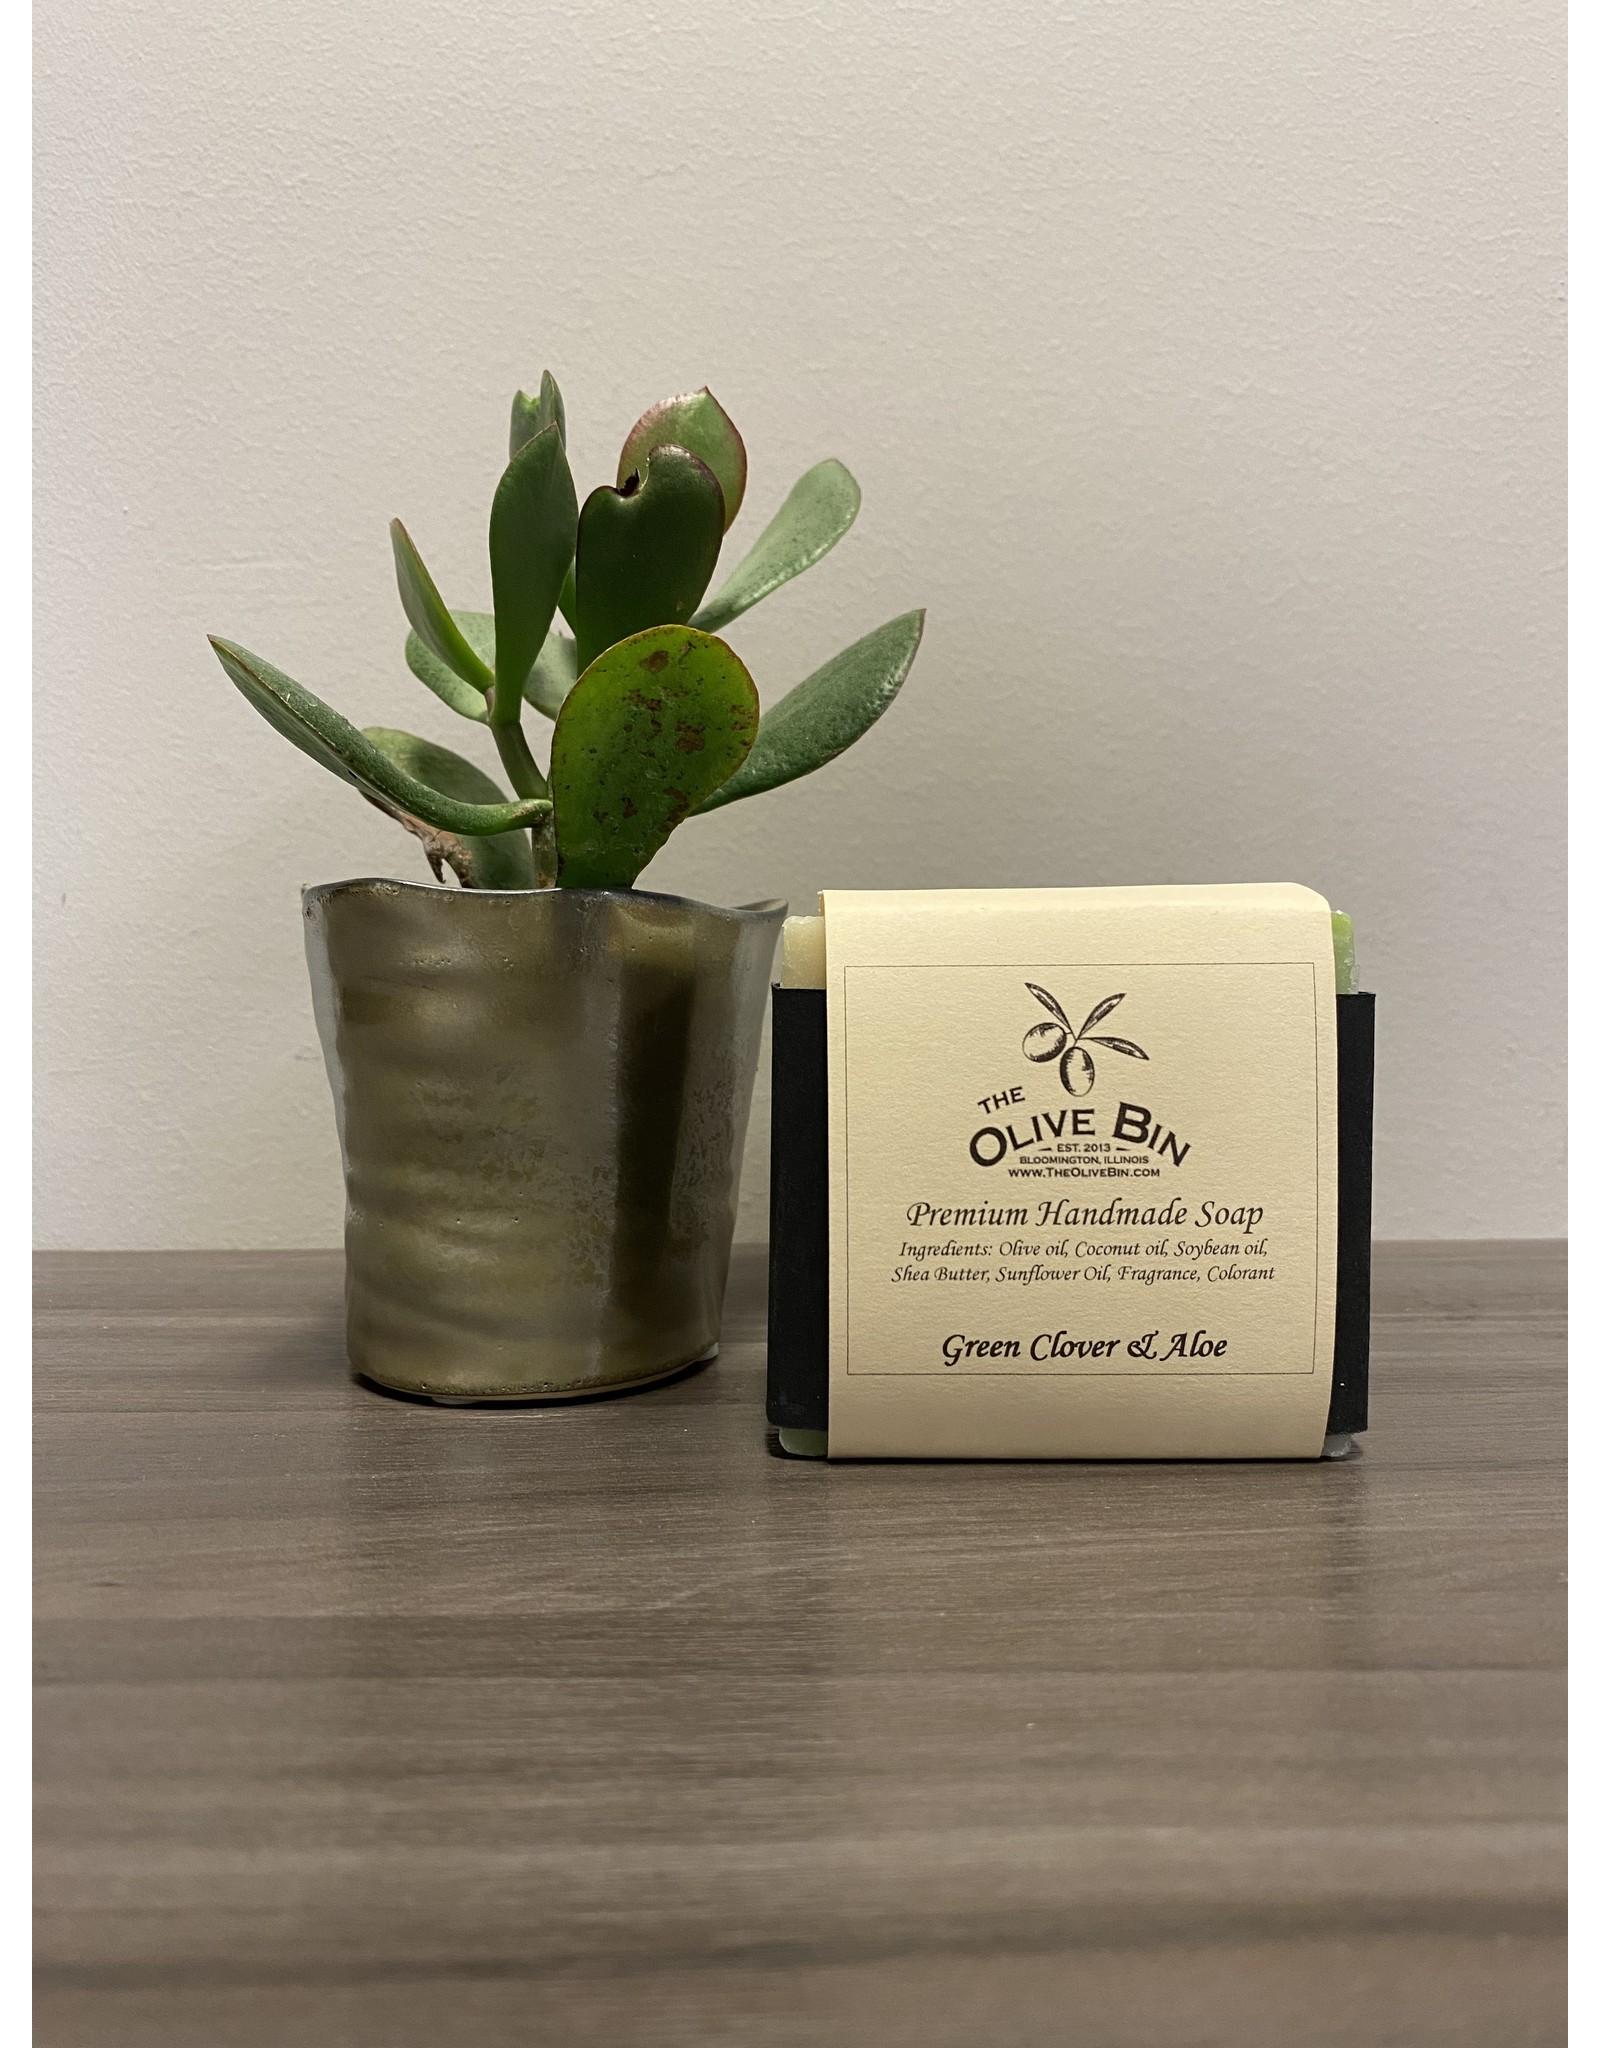 Soap Guy Green Clover & Aloe Soap